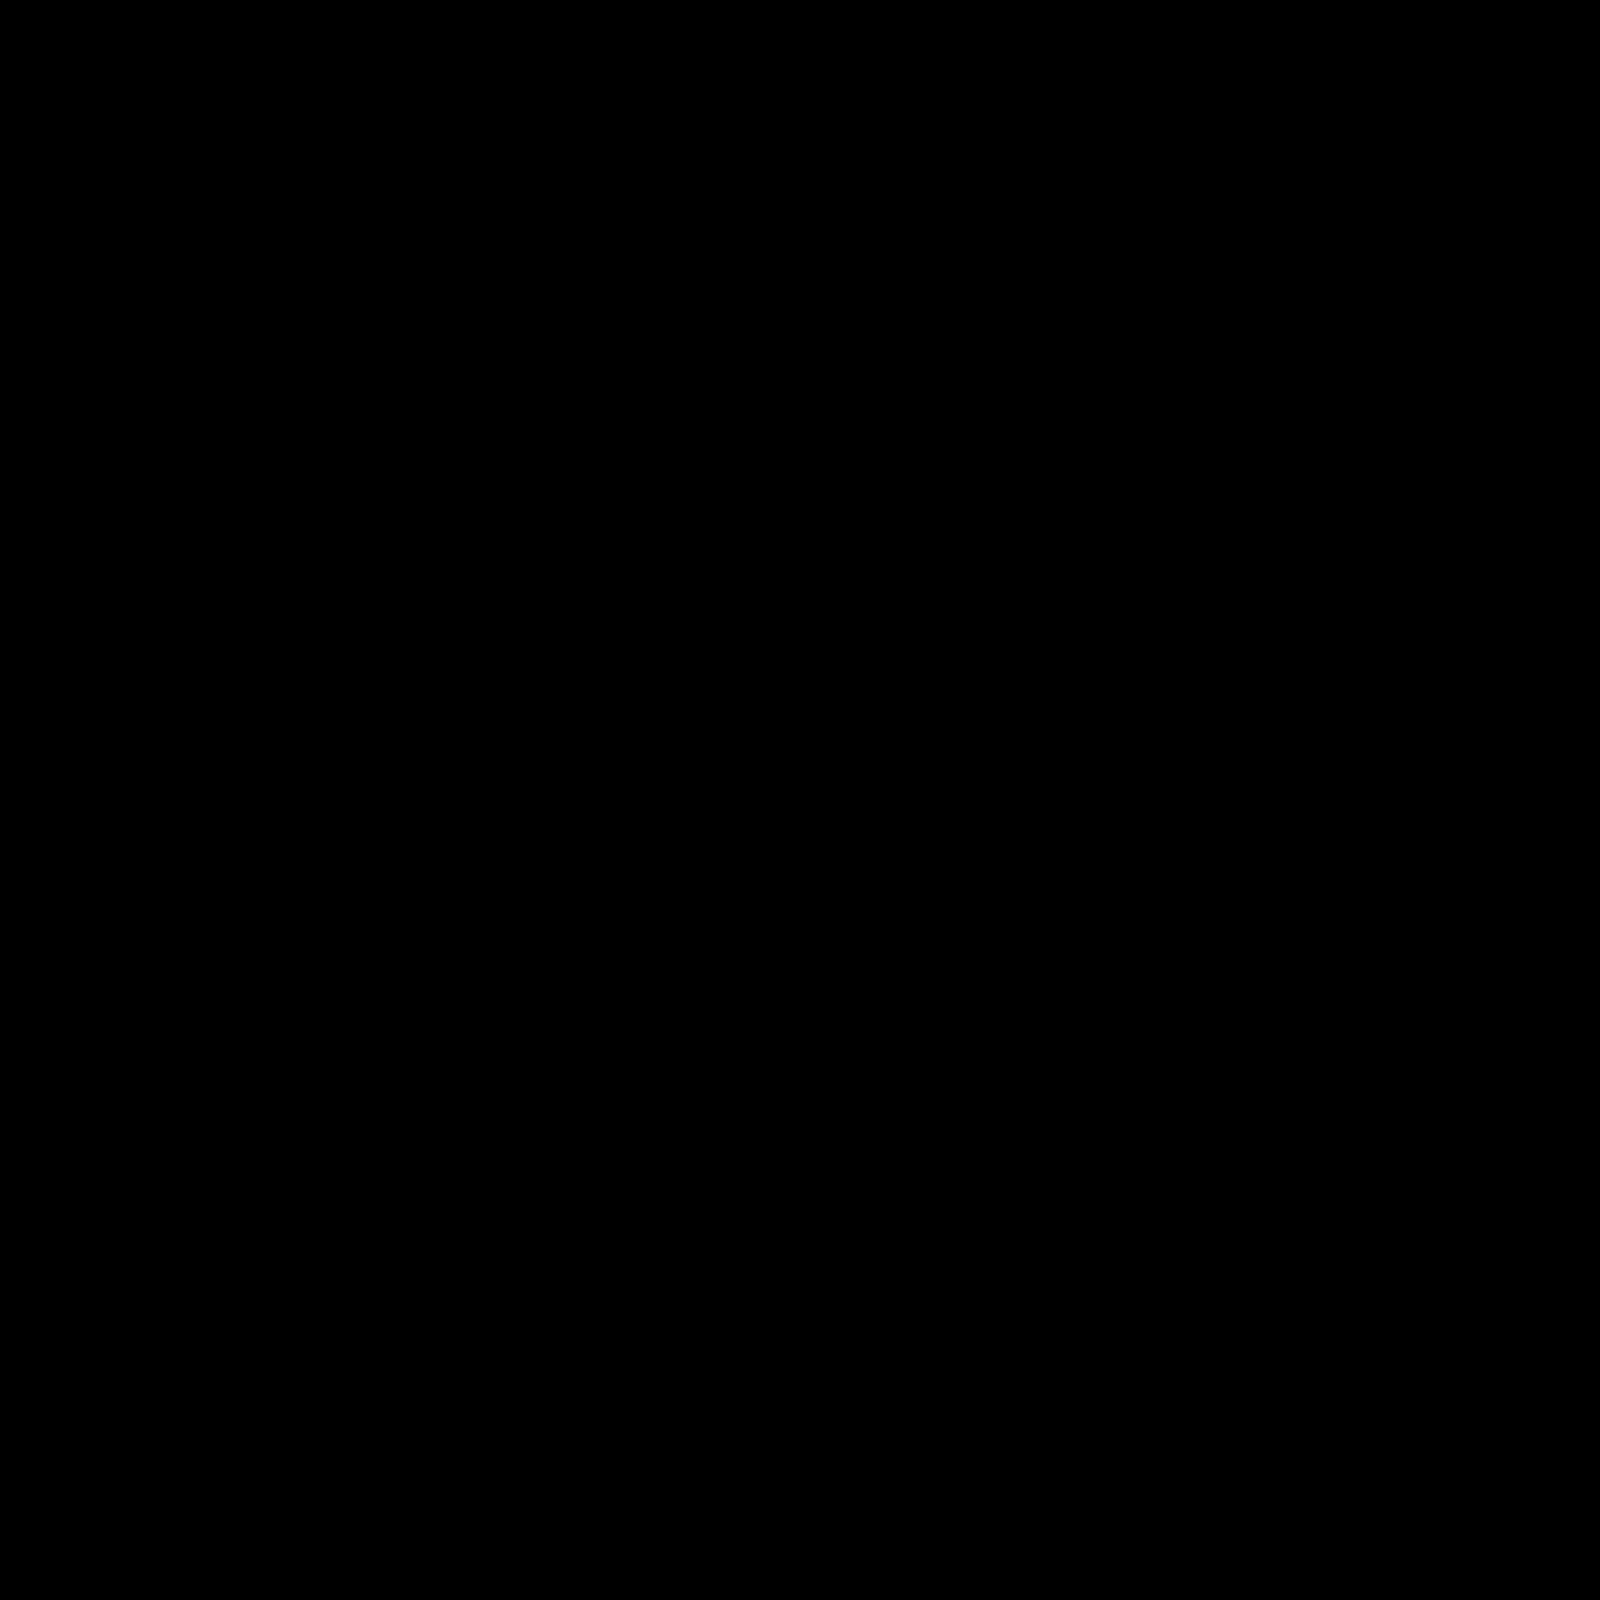 83 icon